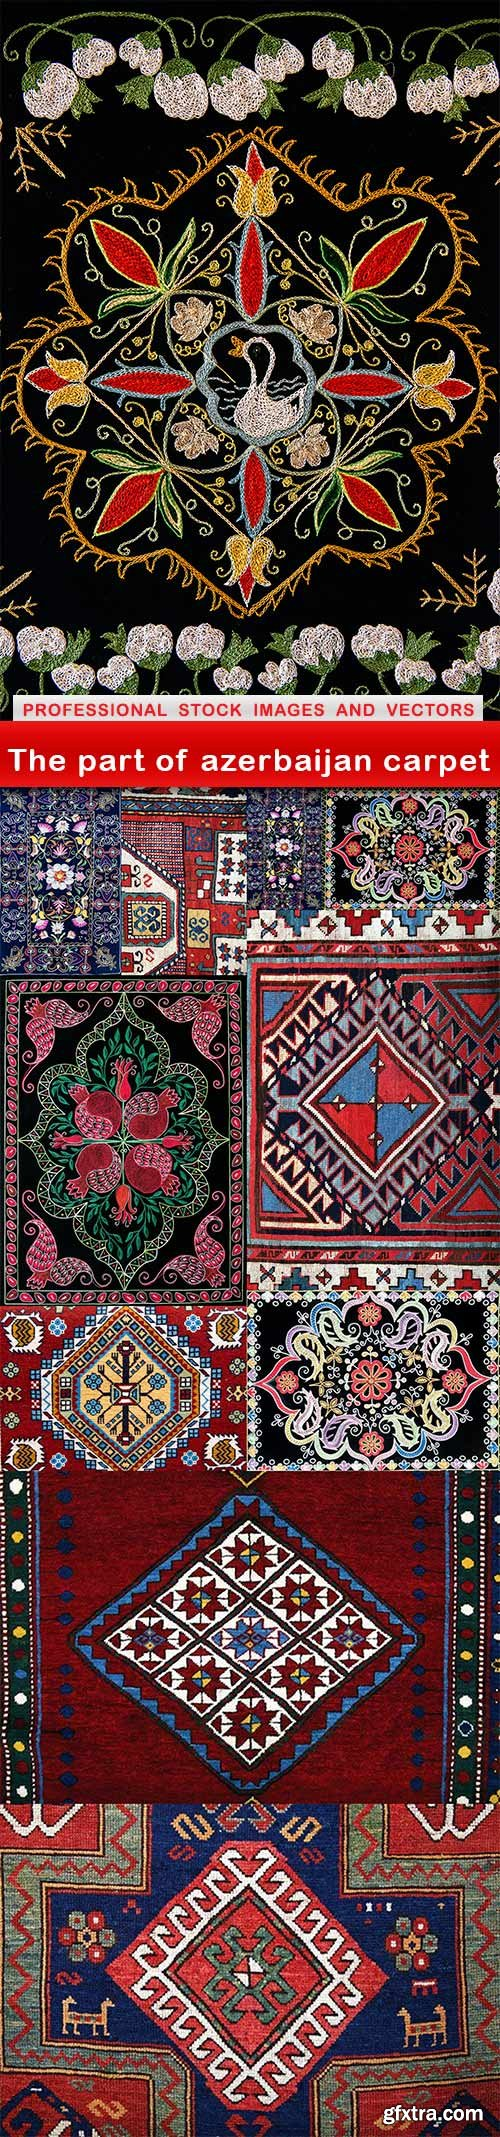 The part of azerbaijan carpet - 11 UHQ JPEG